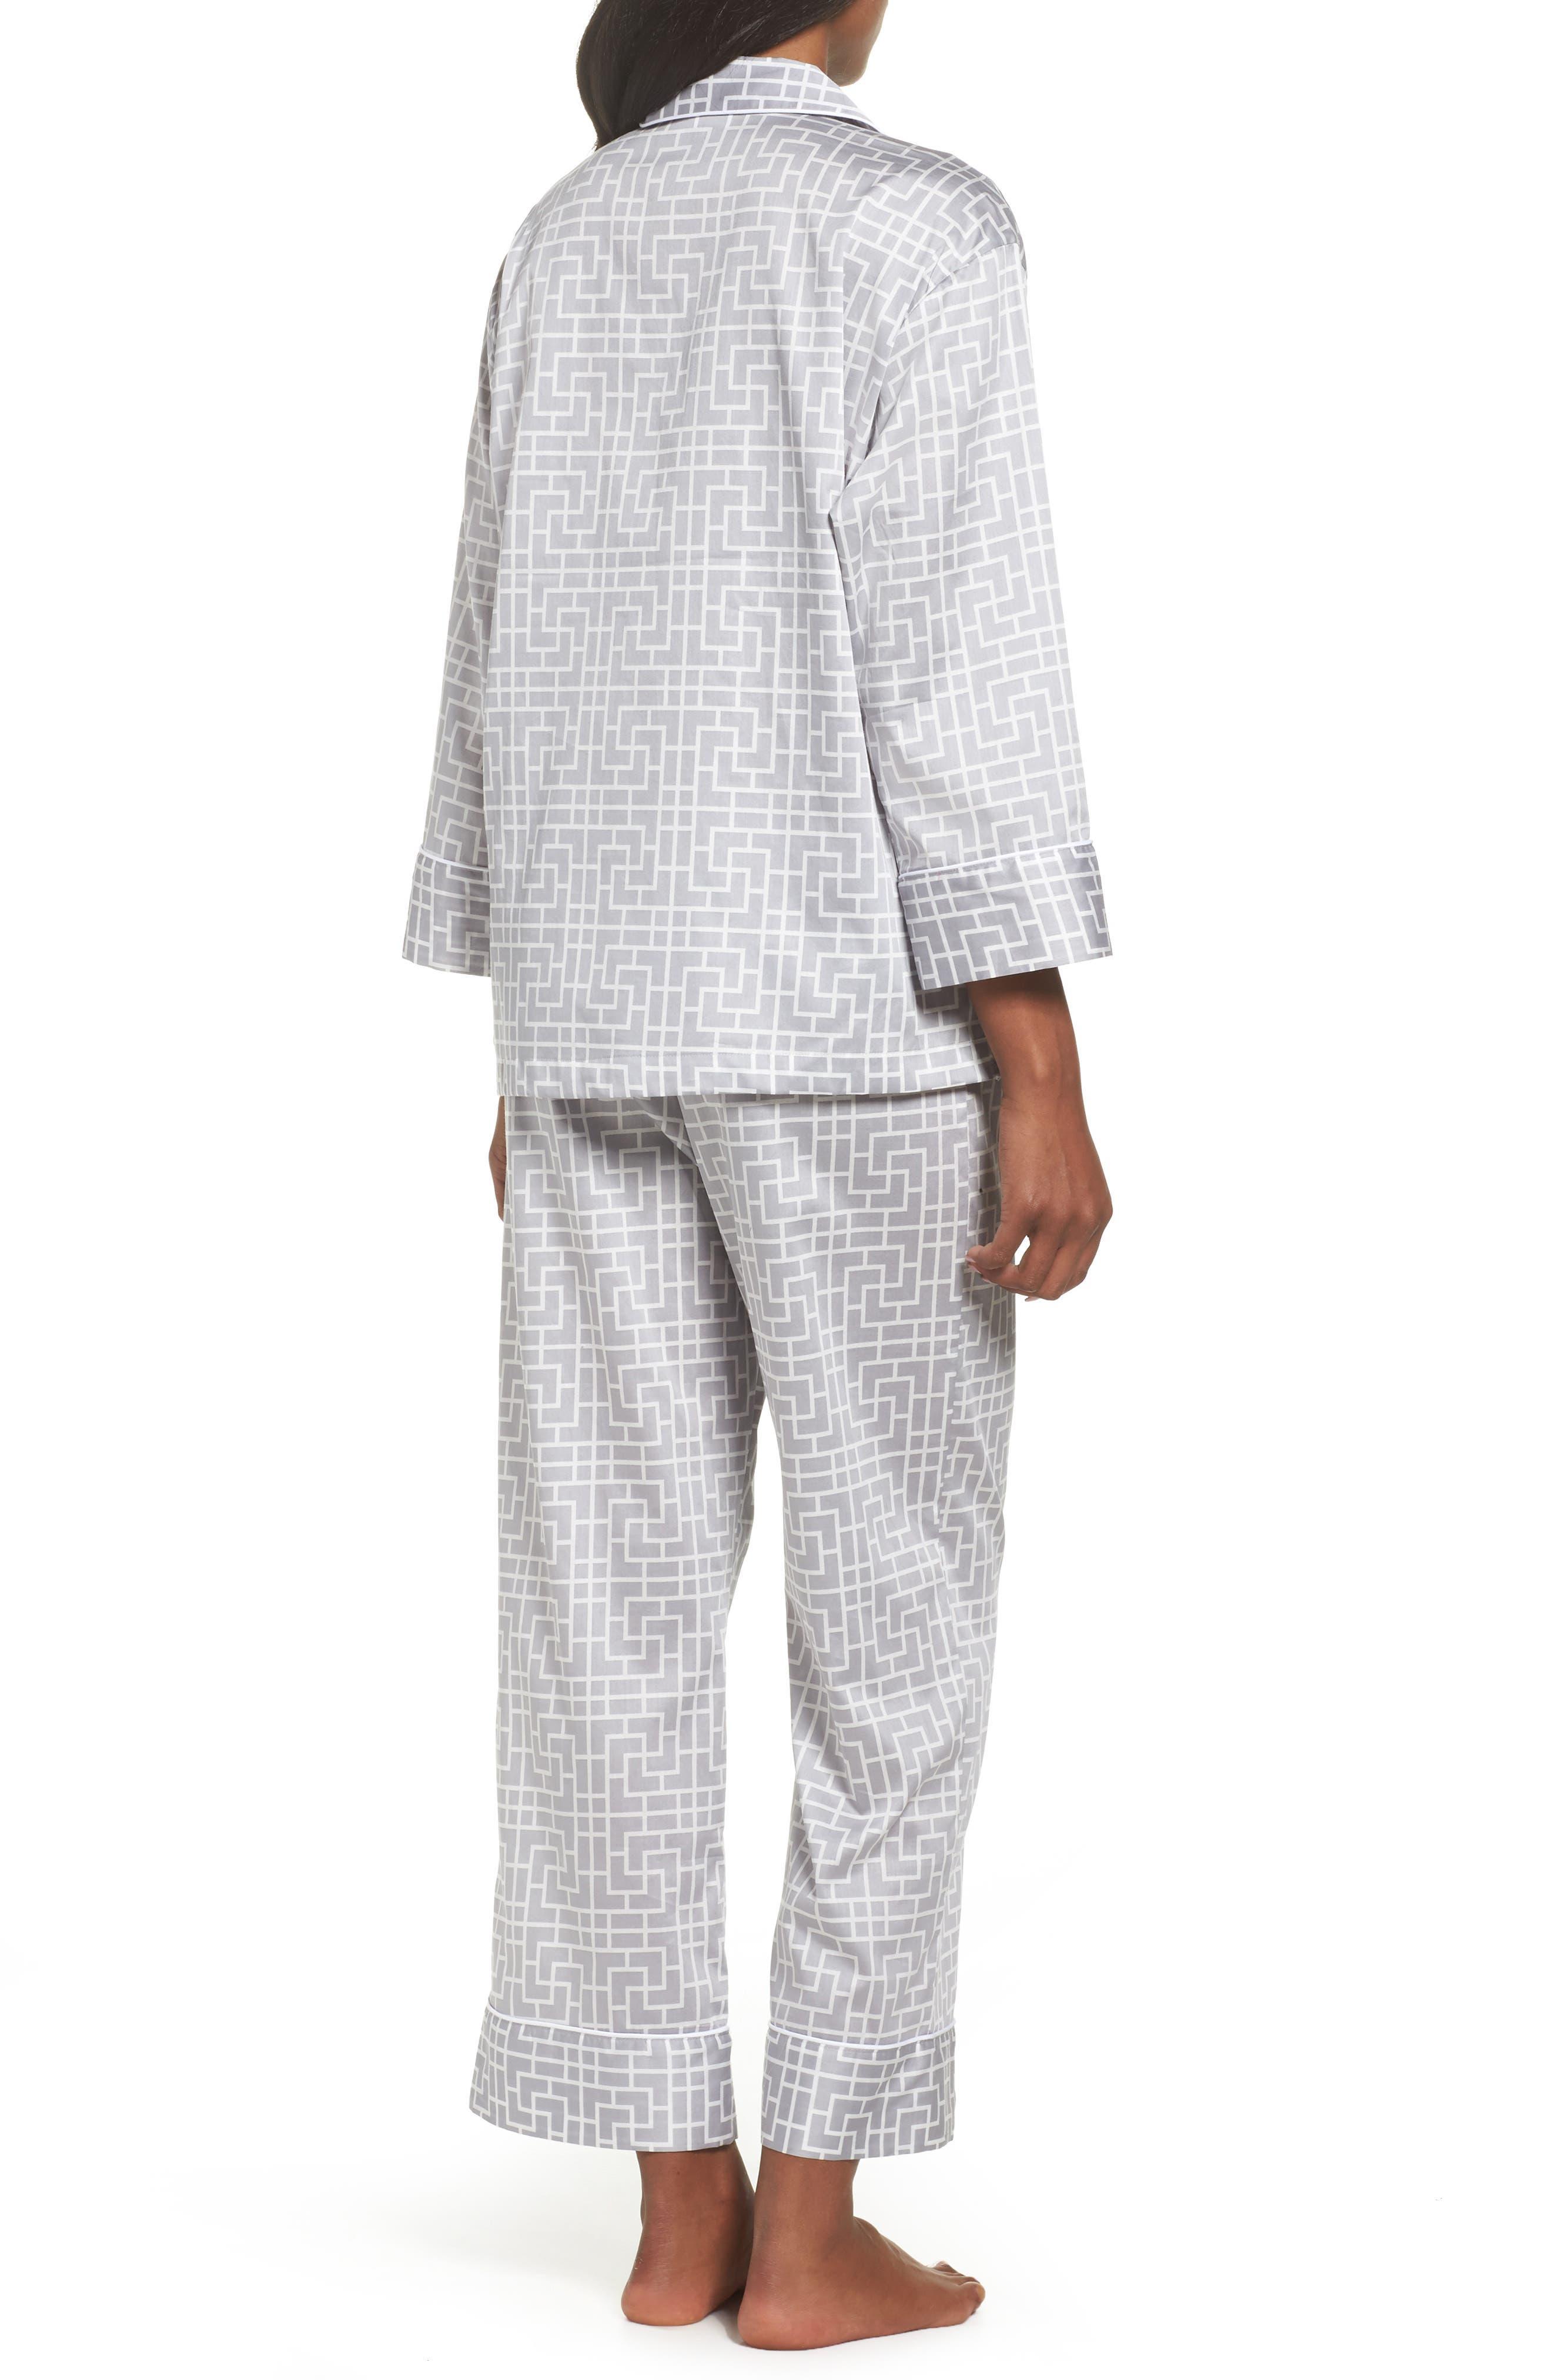 Abstract Maze Sateen Pajamas,                             Alternate thumbnail 2, color,                             020